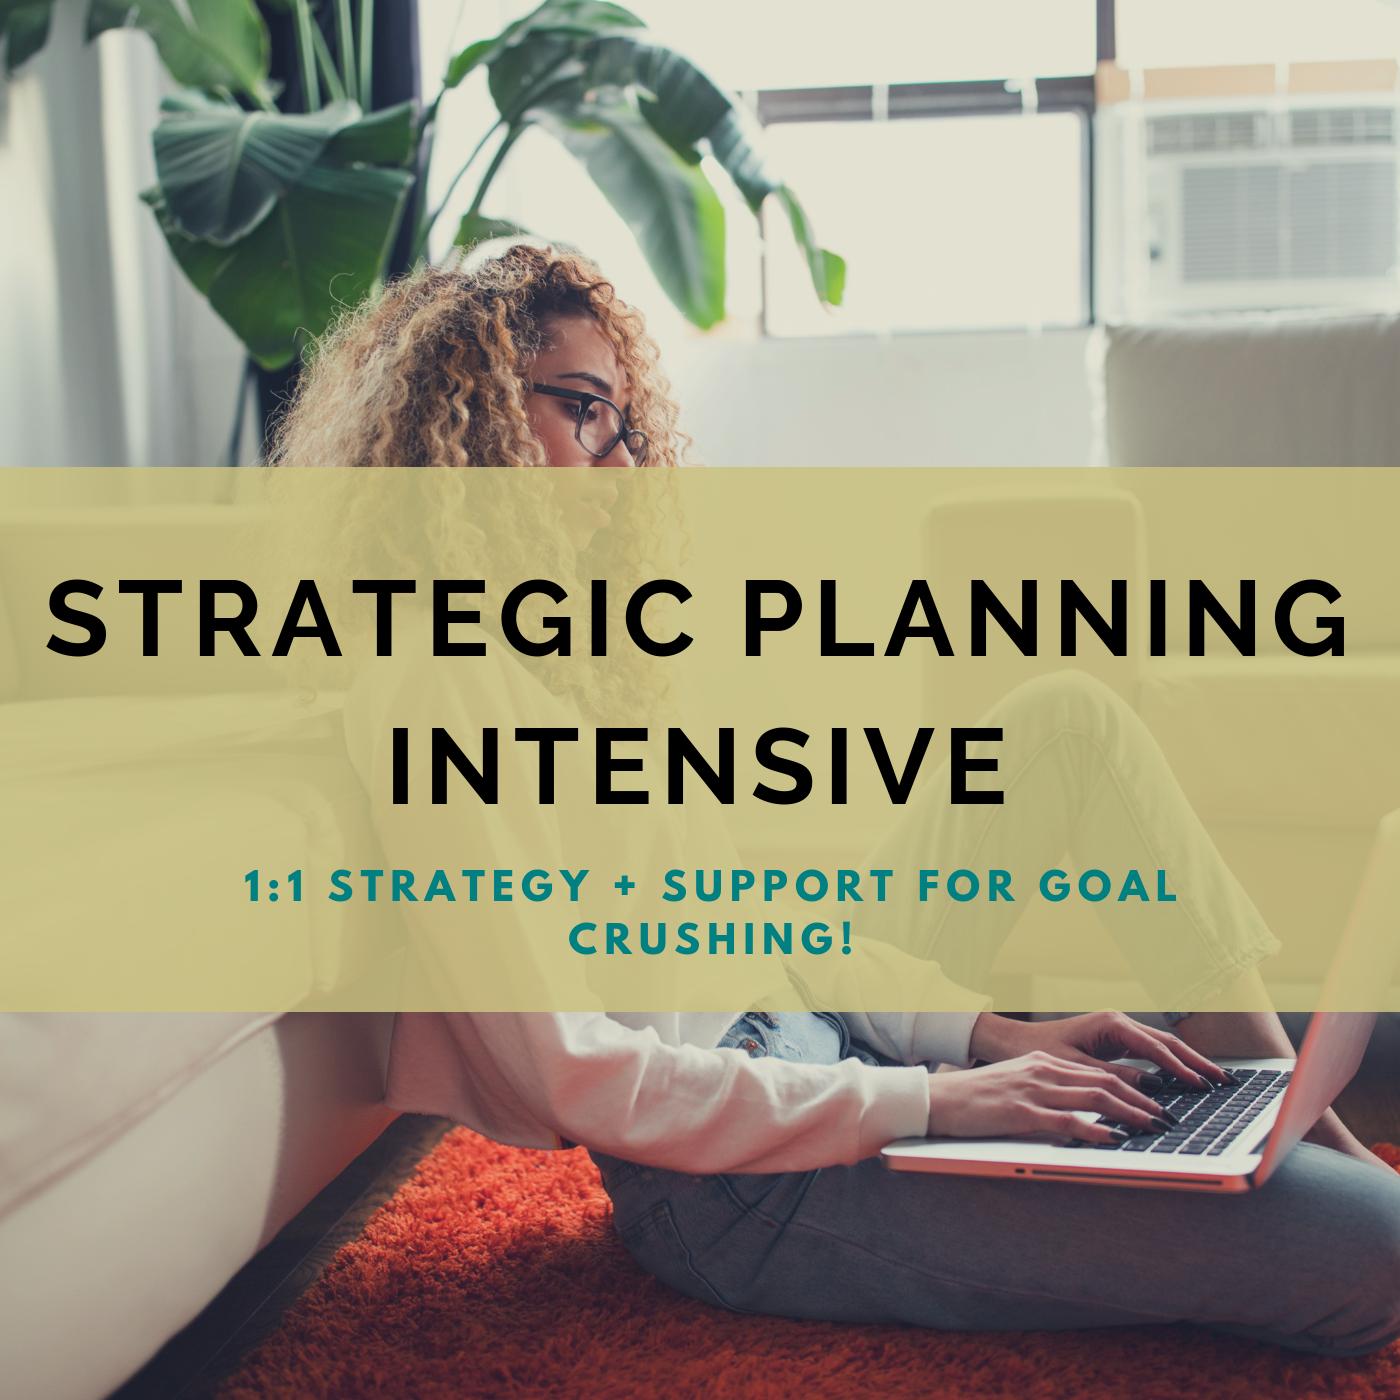 strategicplanningintensive.png